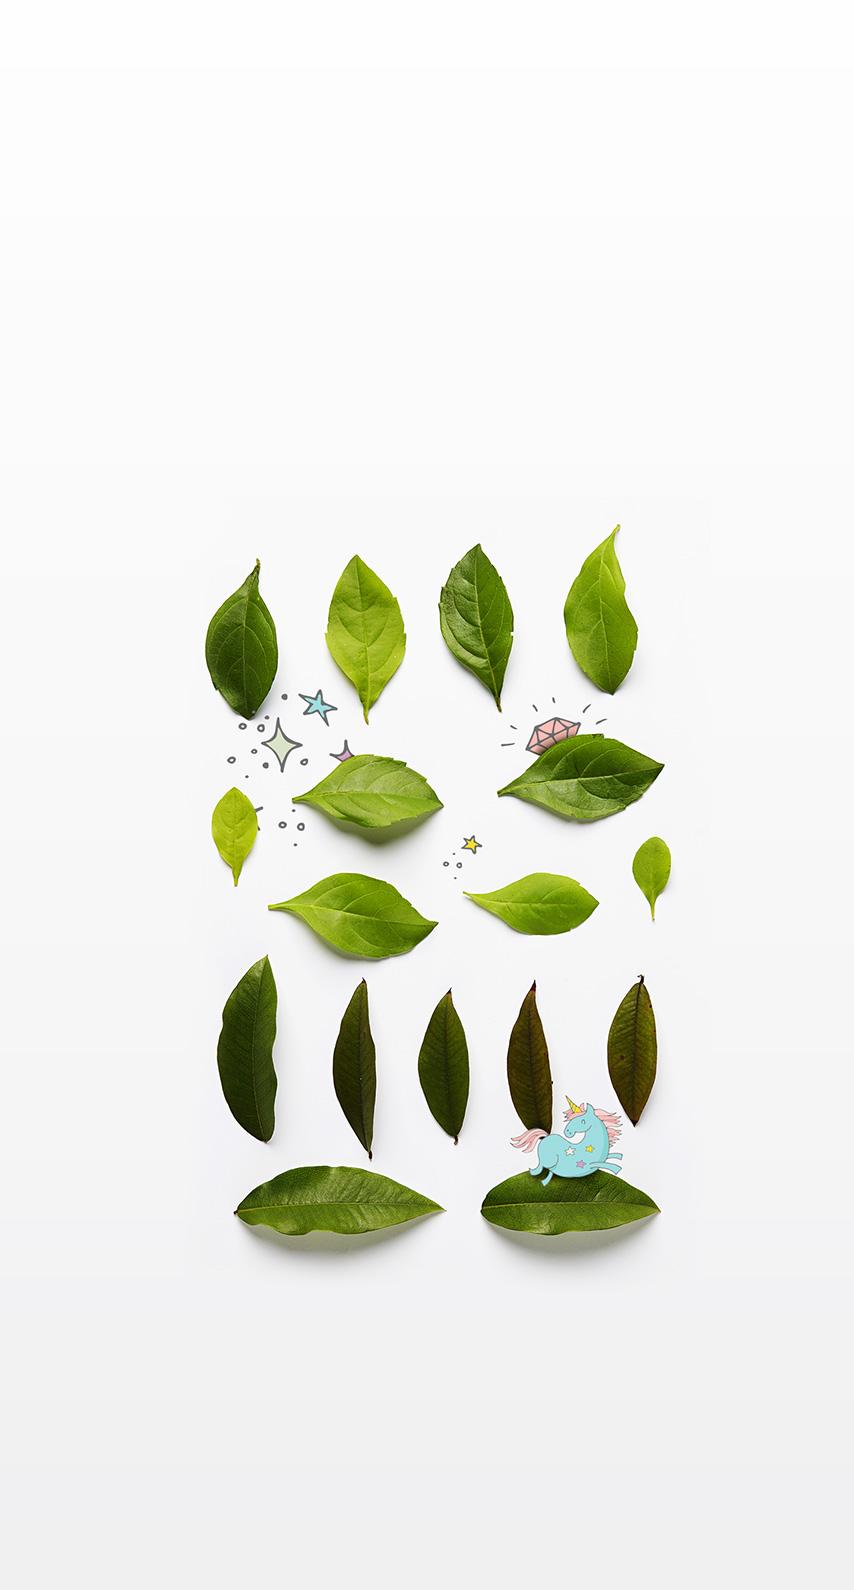 flora, environment